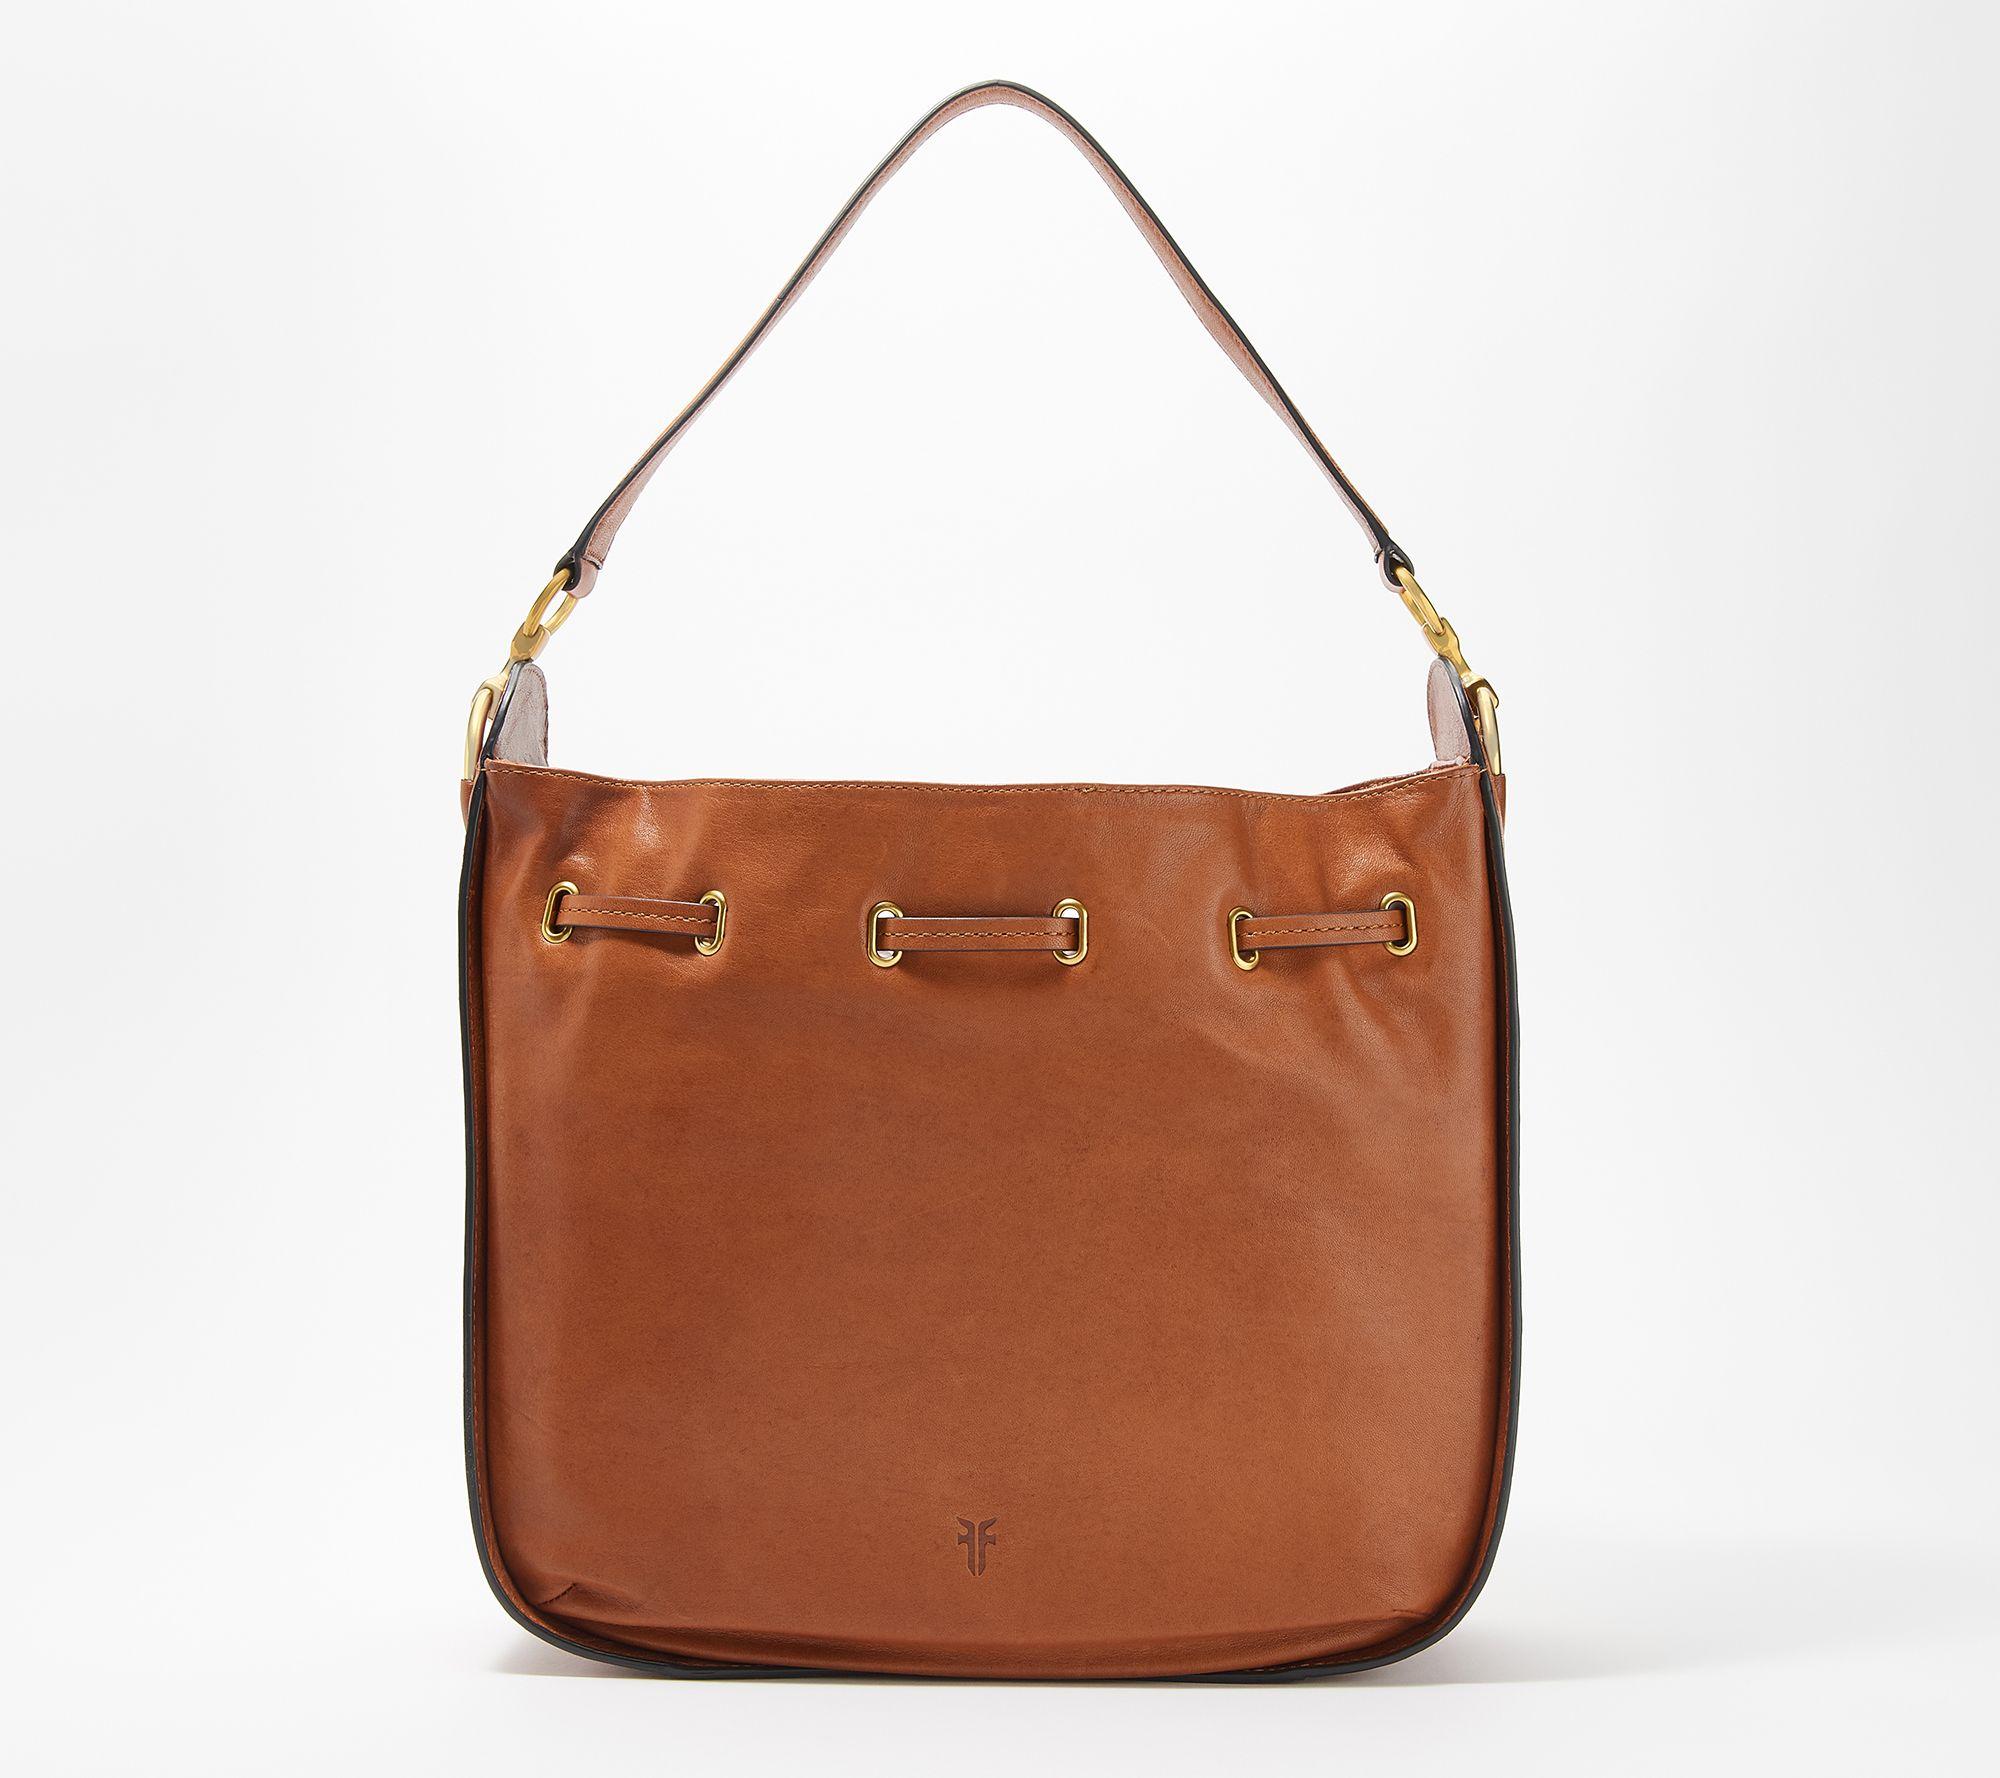 463ccb6c1d Frye Leather Ilana Hobo Handbag — QVC.com